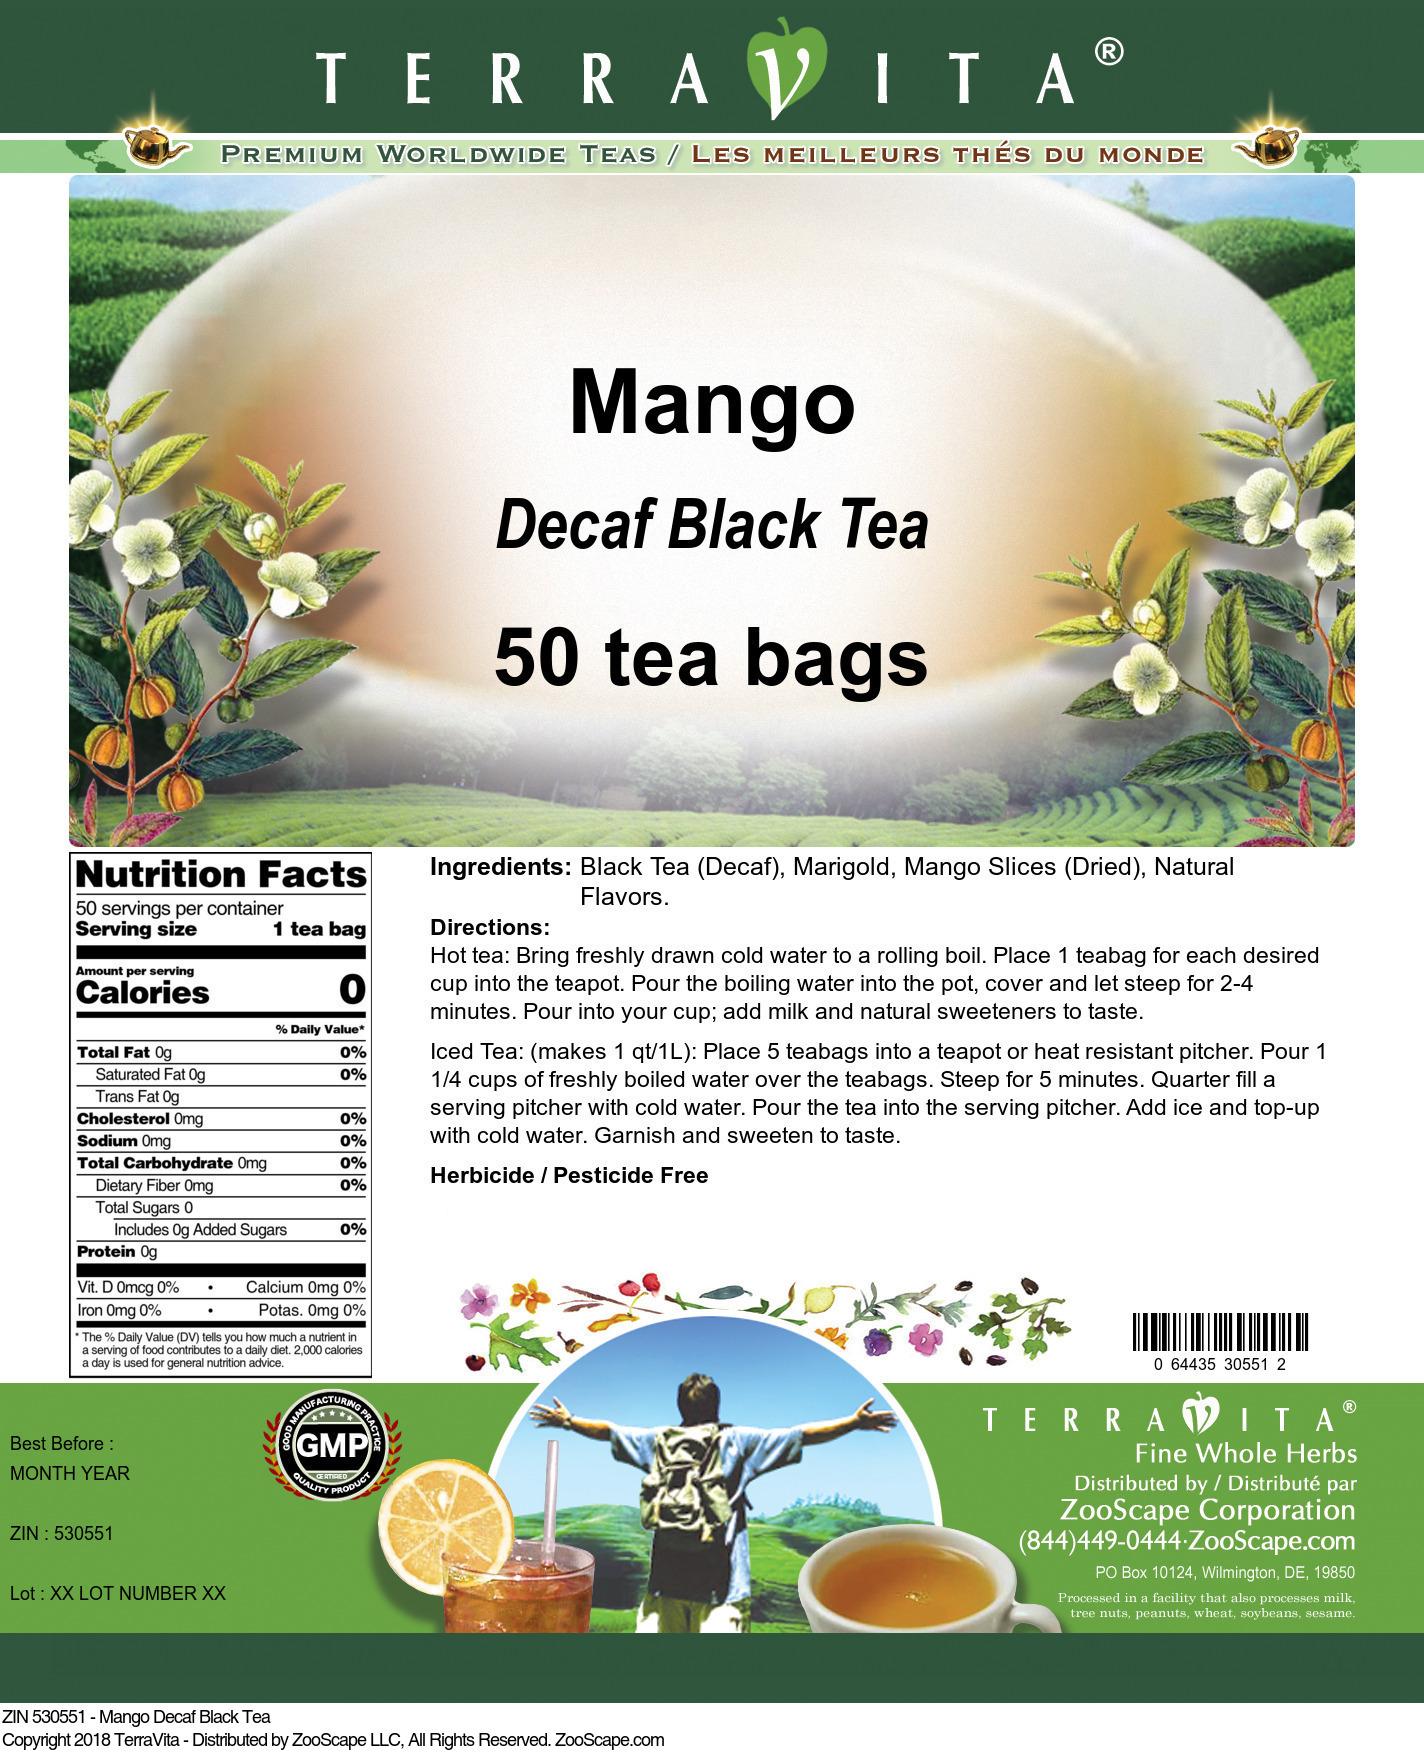 Mango Decaf Black Tea